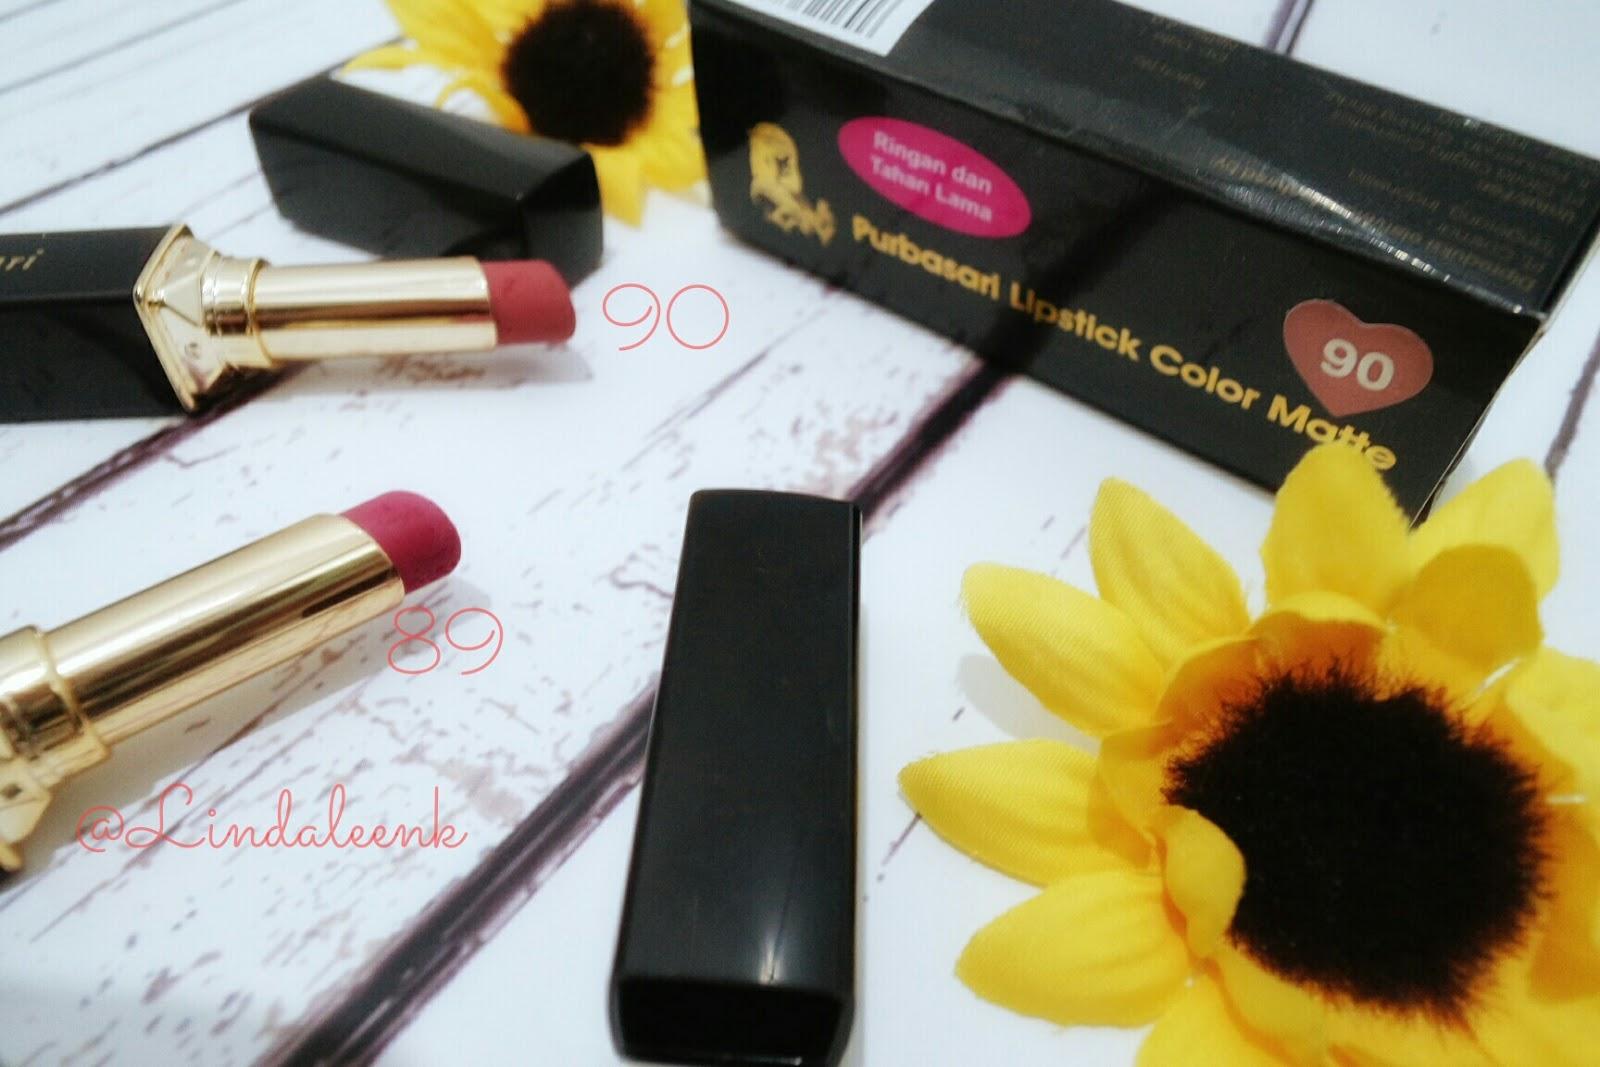 Lingbeauty Purbasari Lipstick Color Matte Lindaleenk Little Part Lipstik Collor 89 Review